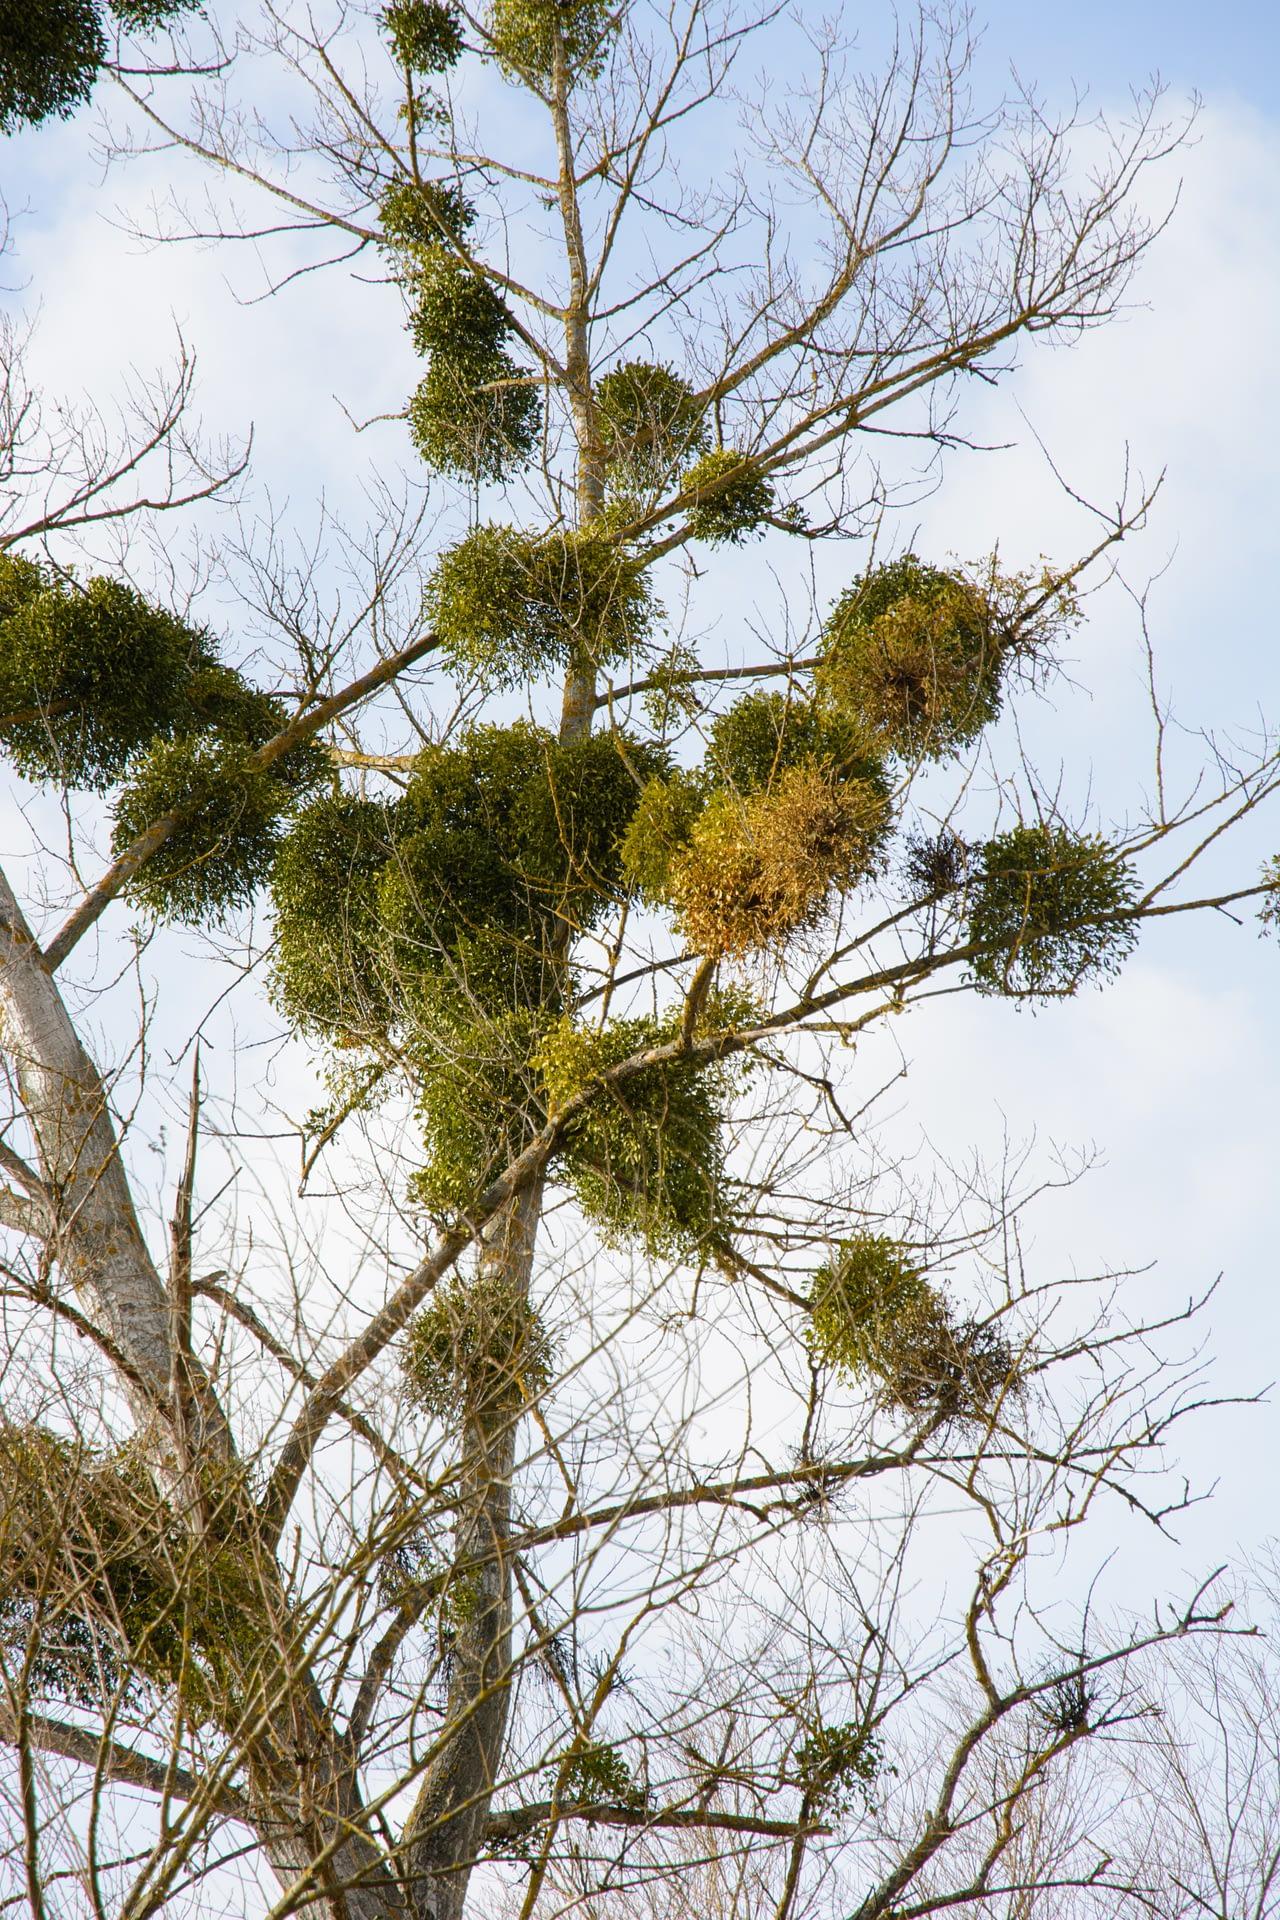 mistletoe in a deciduous tree